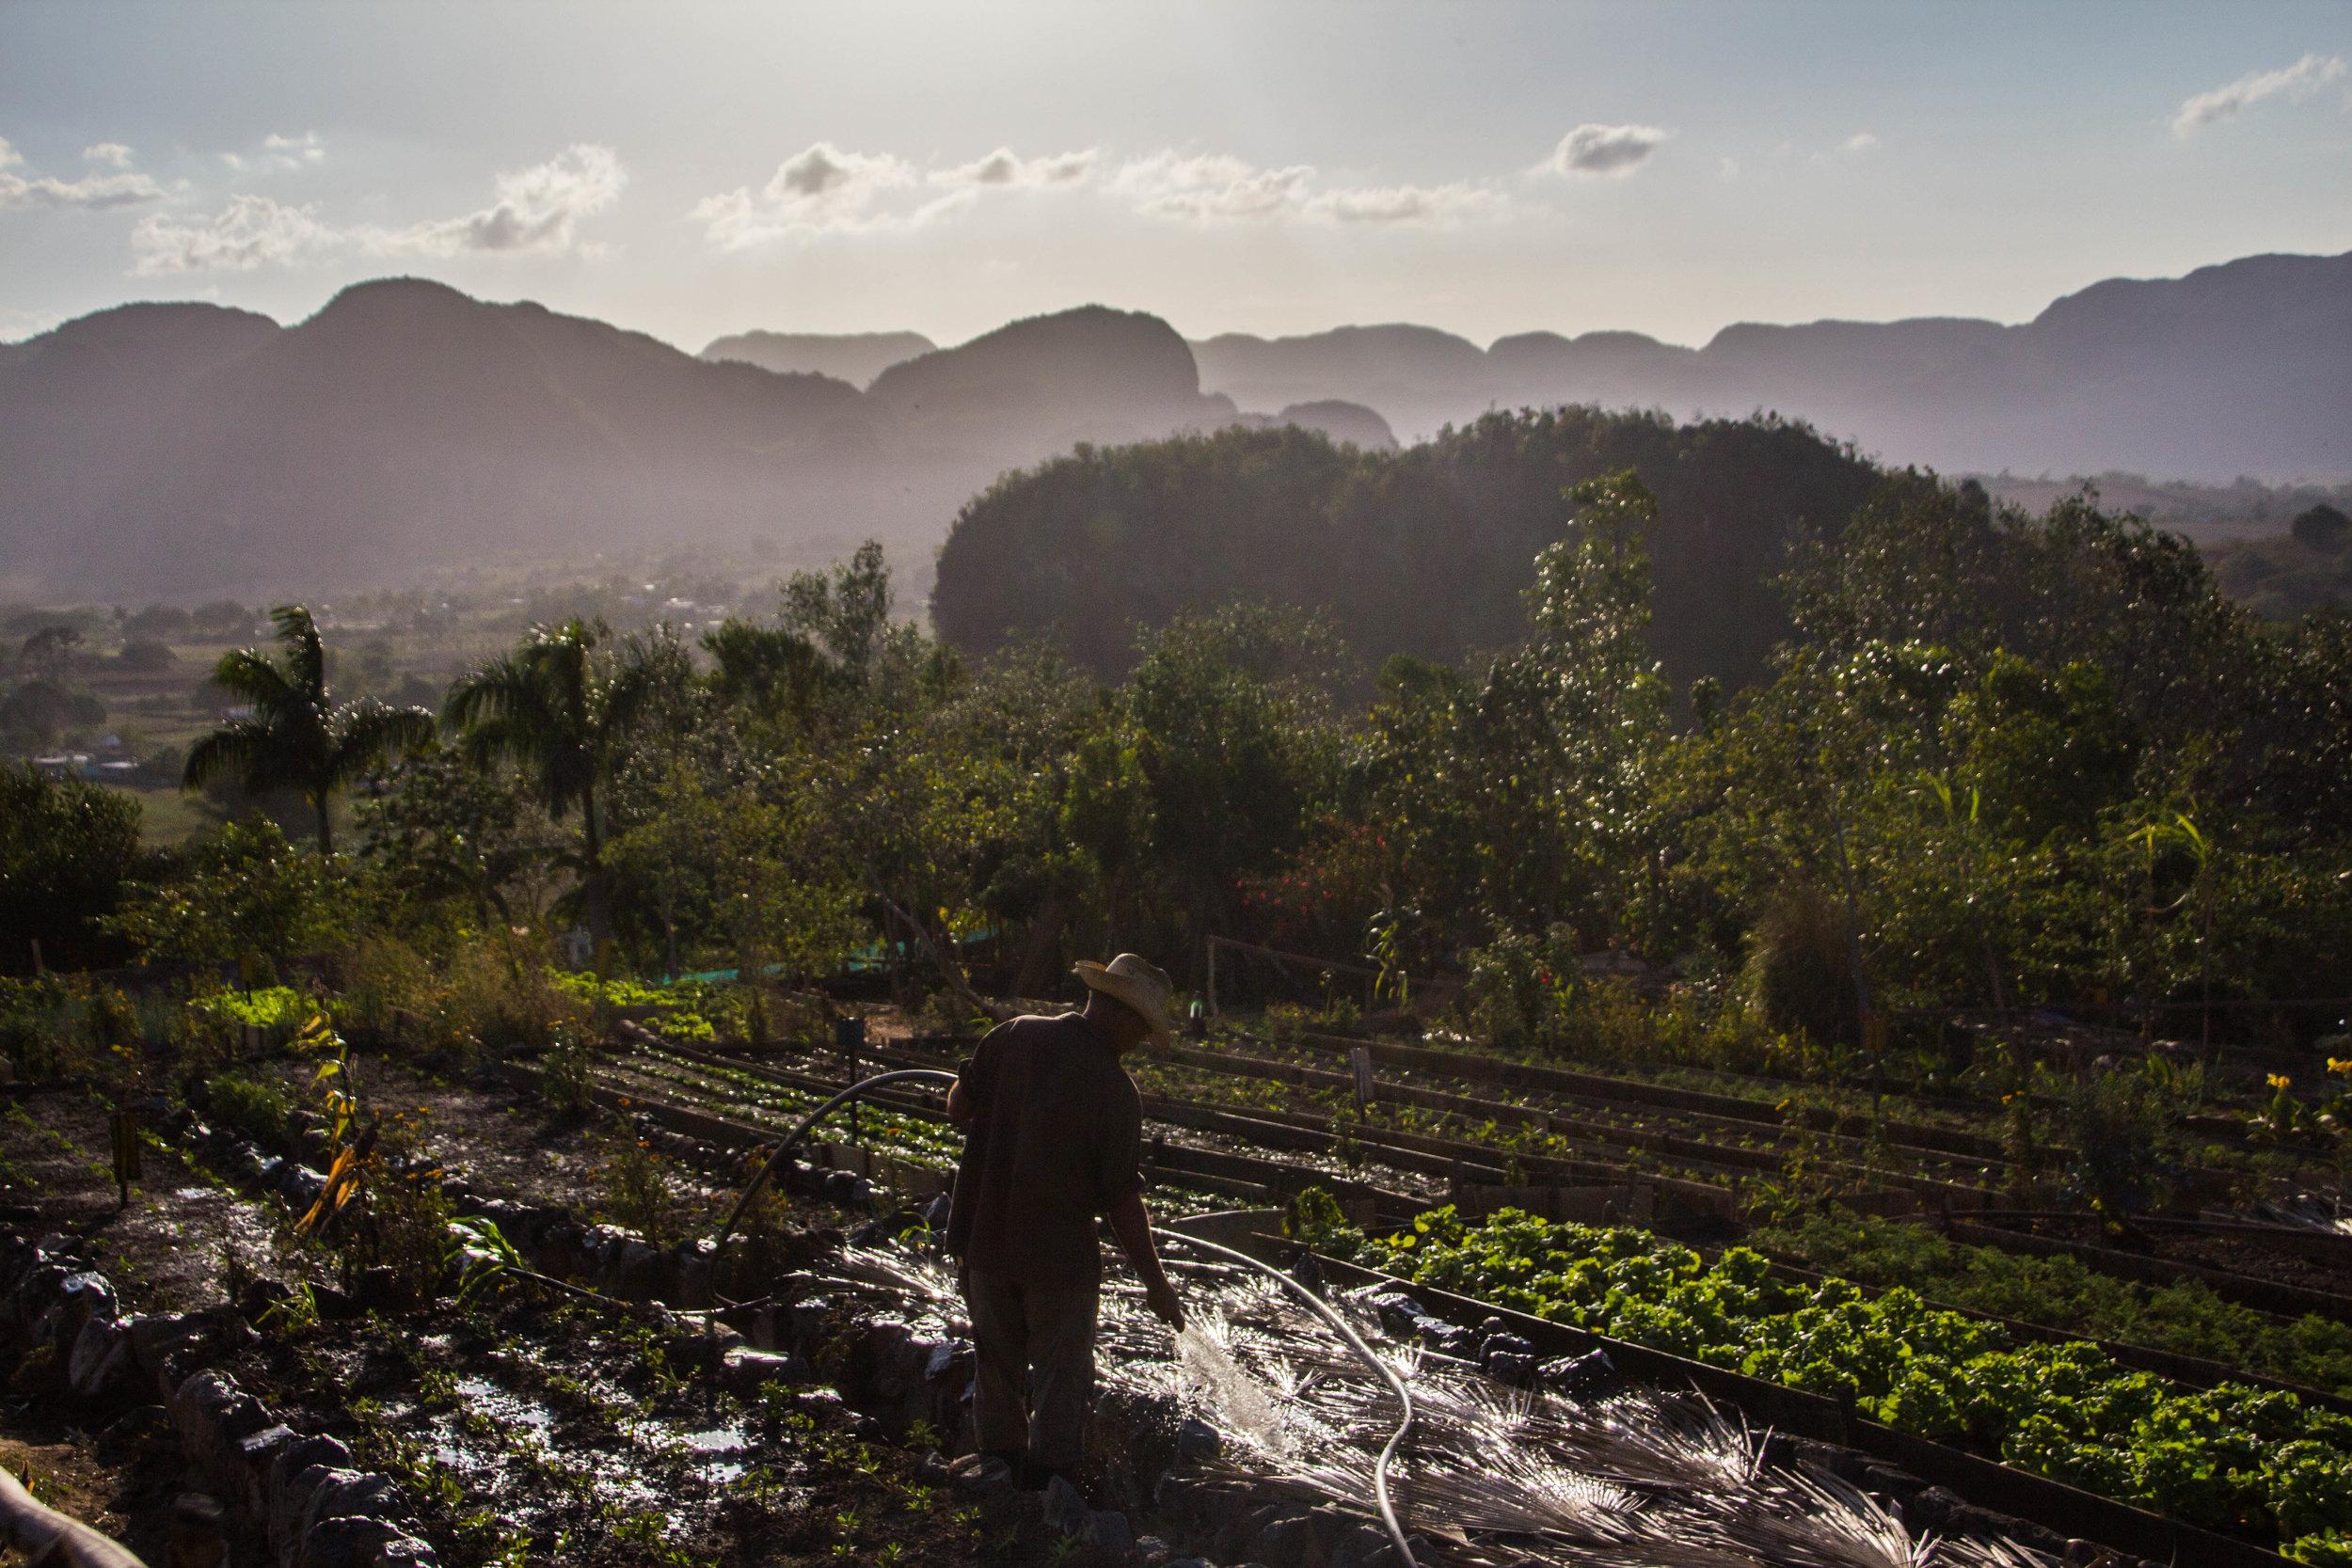 finca agroecological el paraiso restaurant viñales cuba-1-3-2.jpg